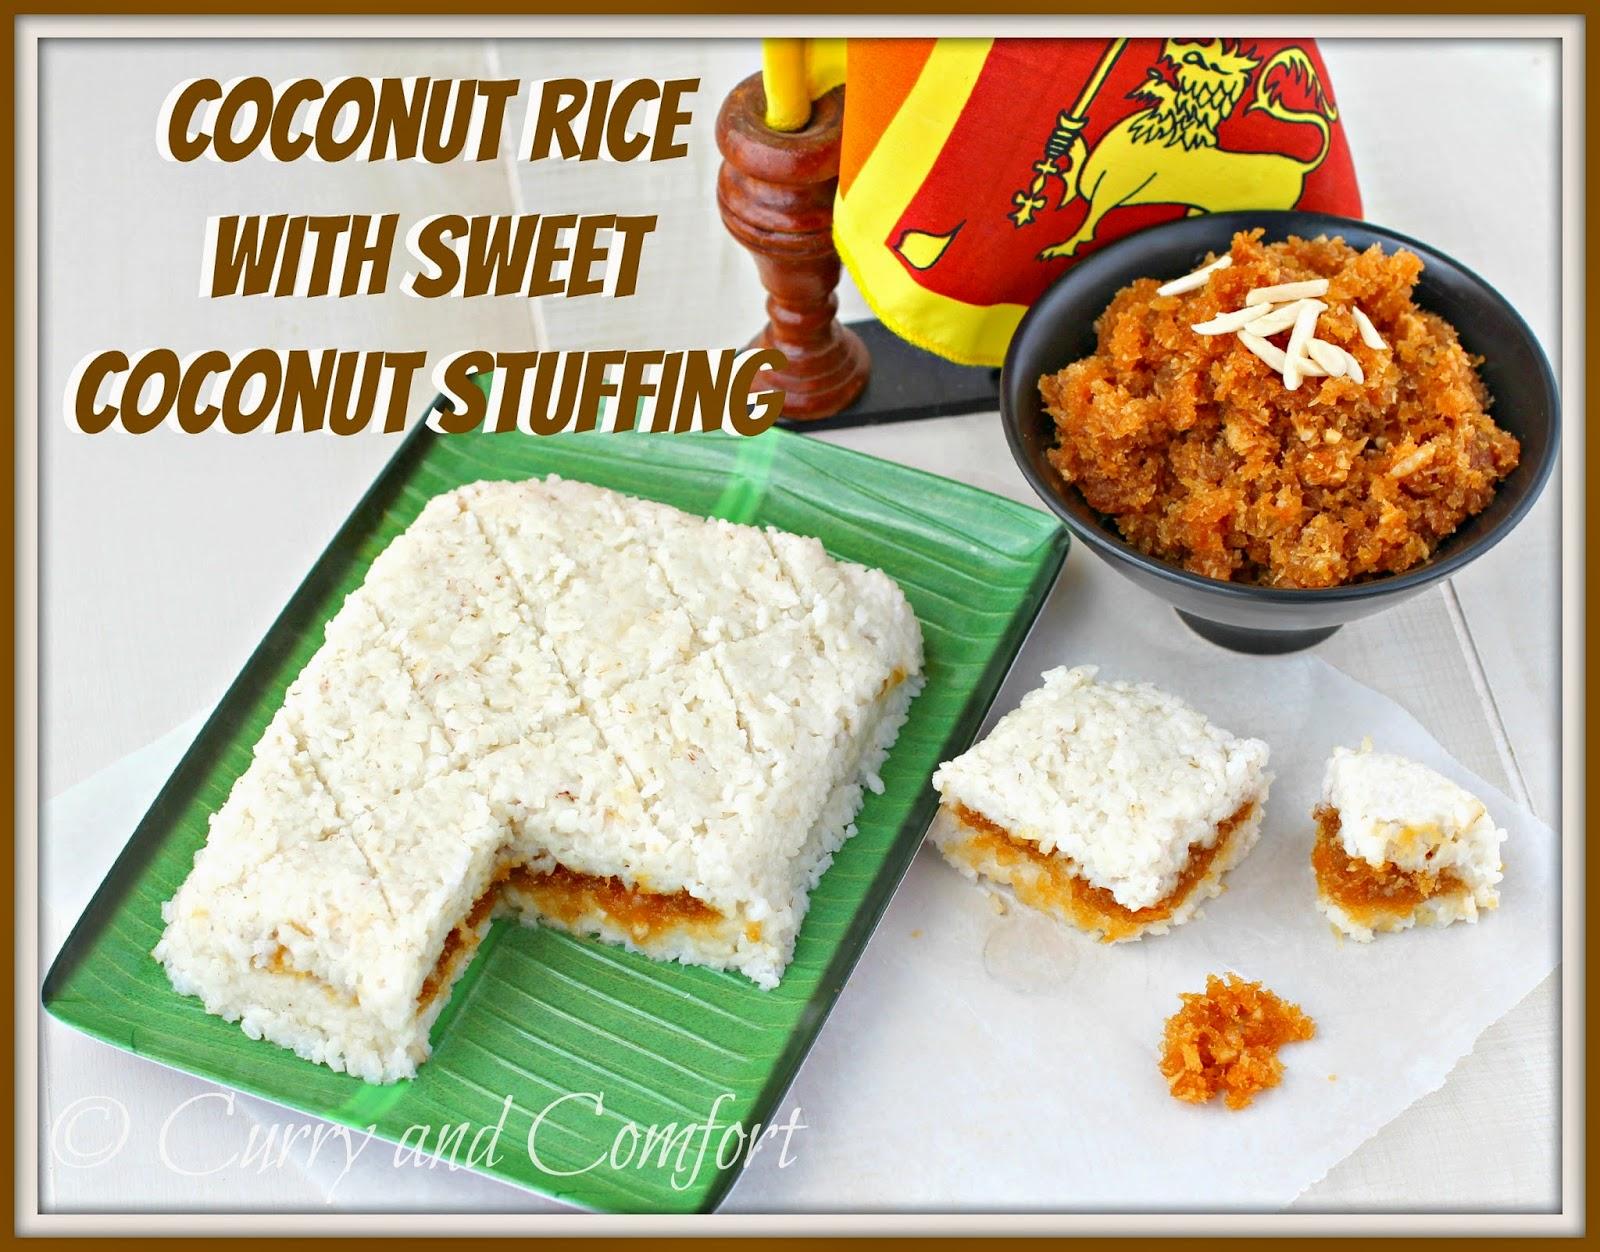 26 amazing sinhala new year food sinhala new year food recipes kitchen simmer sri lankan coconut milk rice with sweet coconut for sinhala forumfinder Choice Image